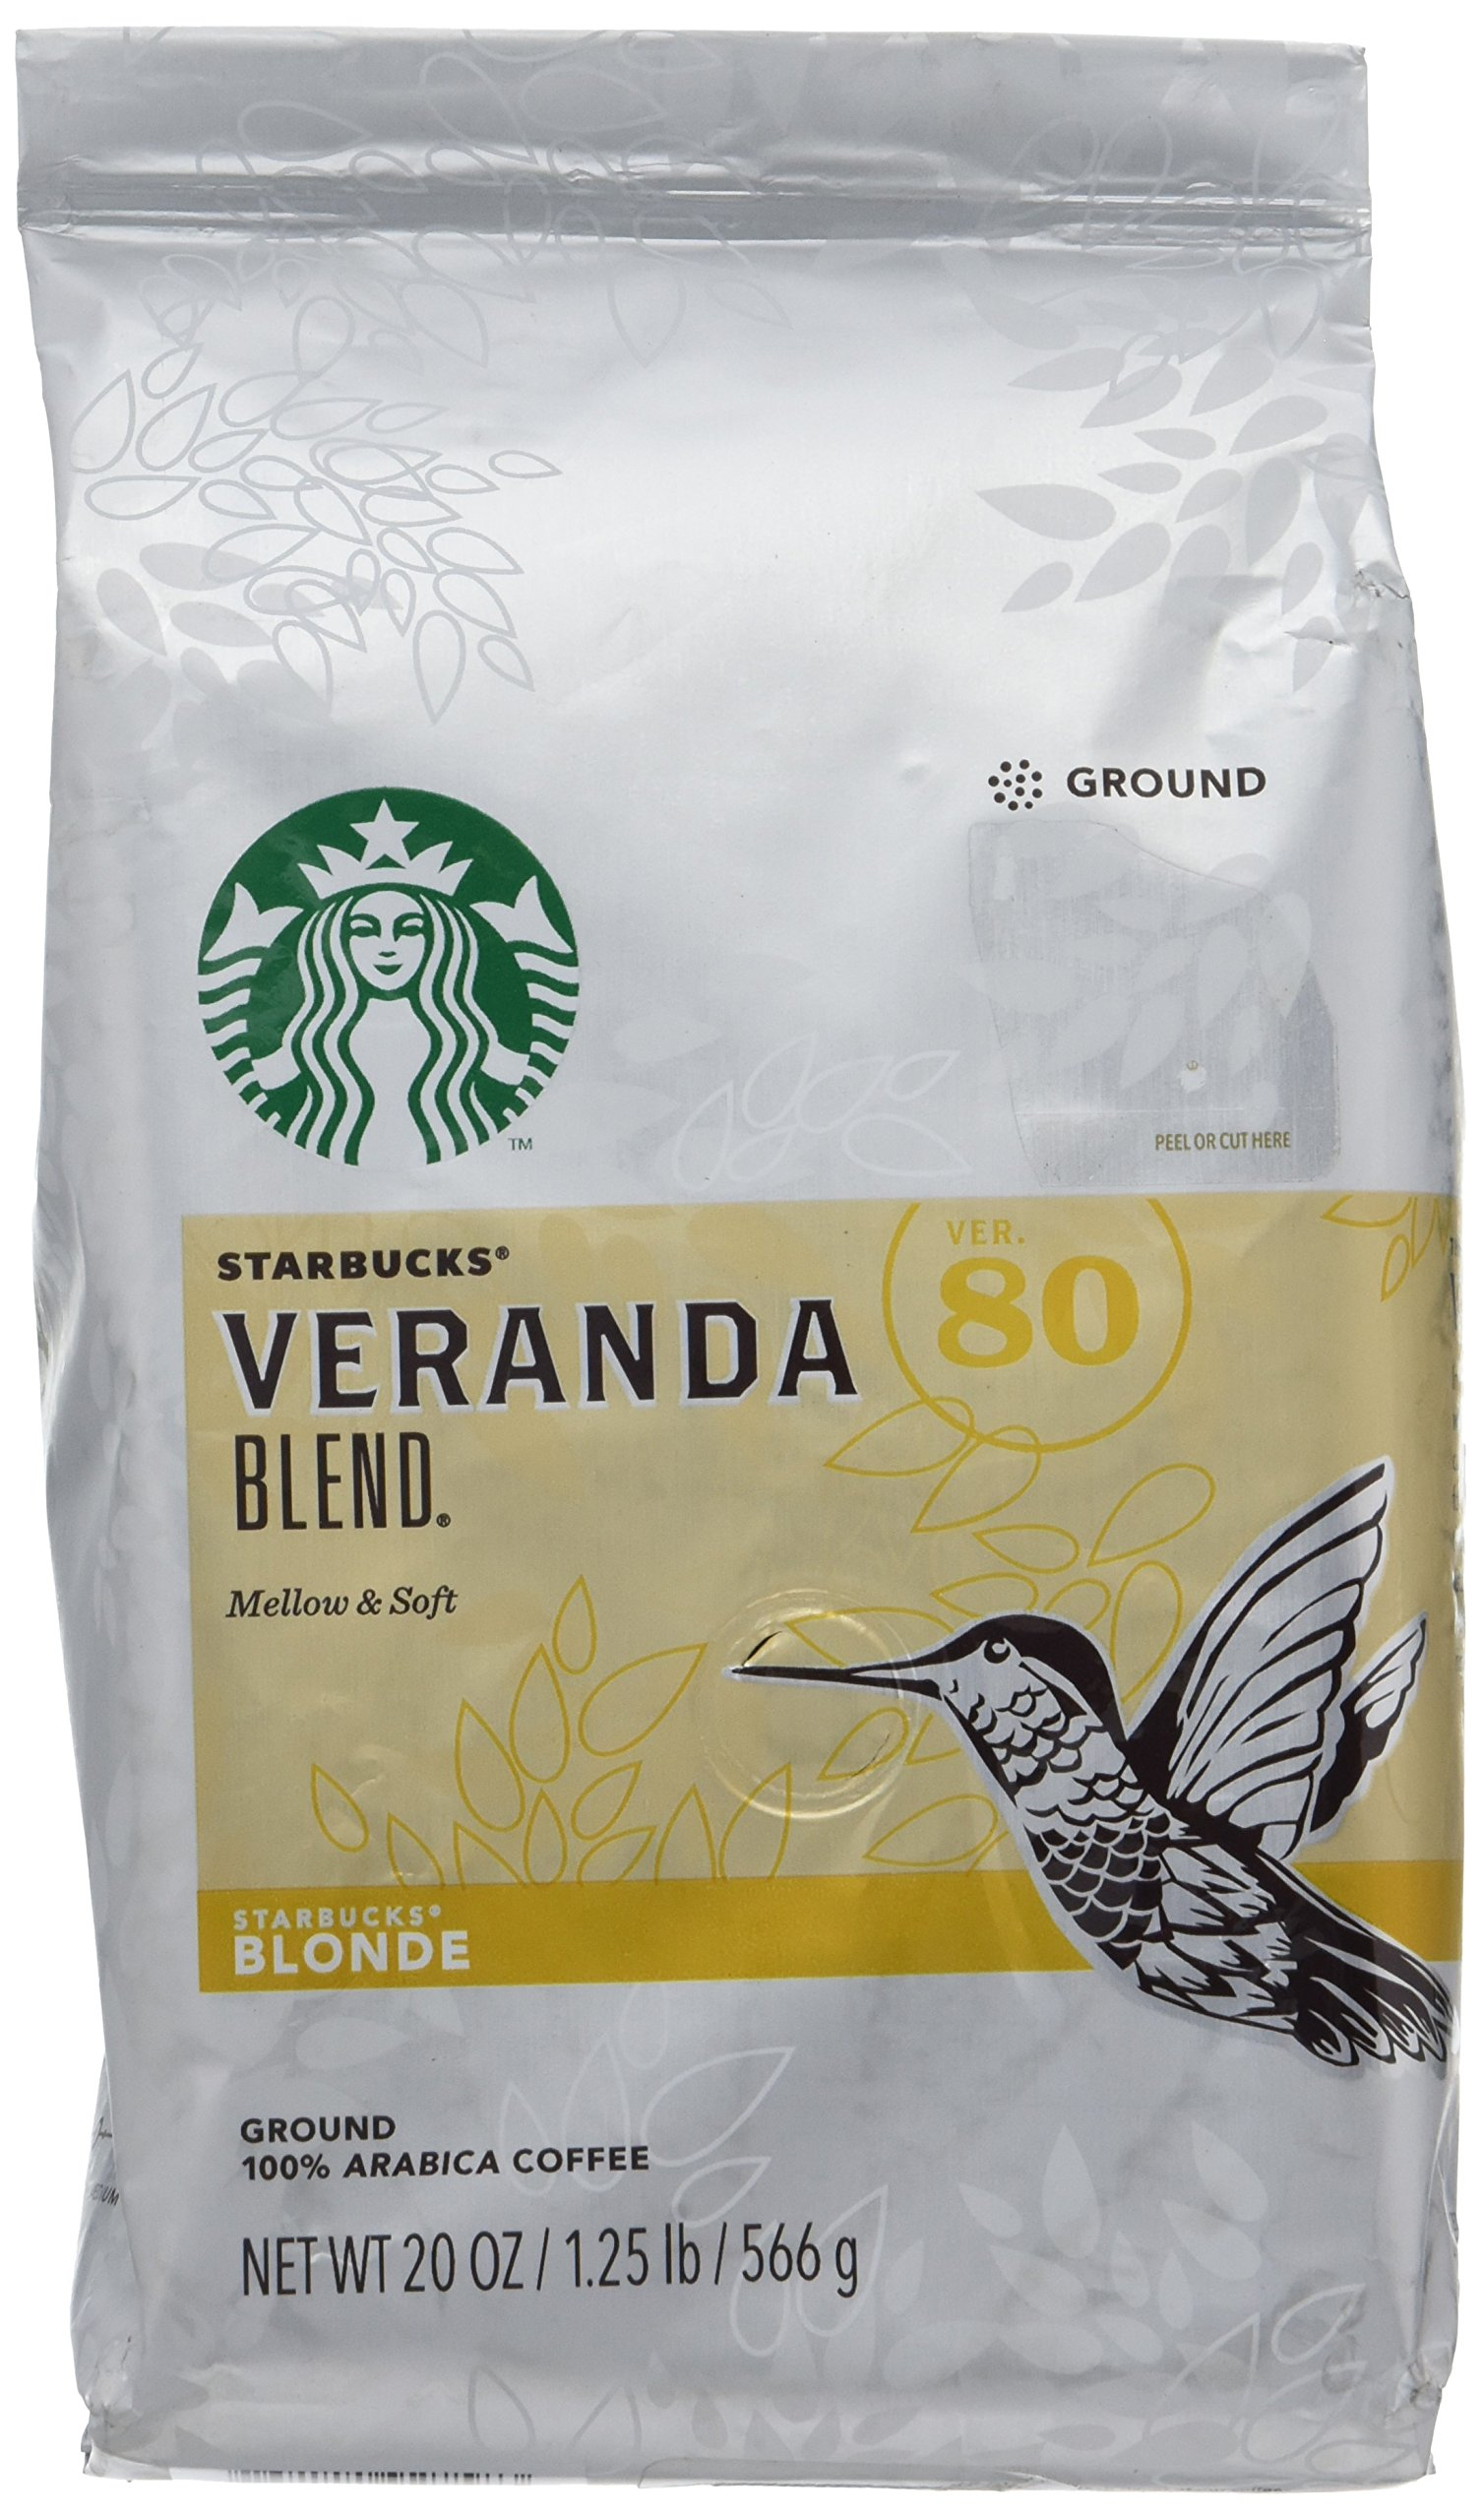 Starbucks Veranda Blend Coffee, Ground, 20-Ounce Bags (Pack of 6) by Starbucks